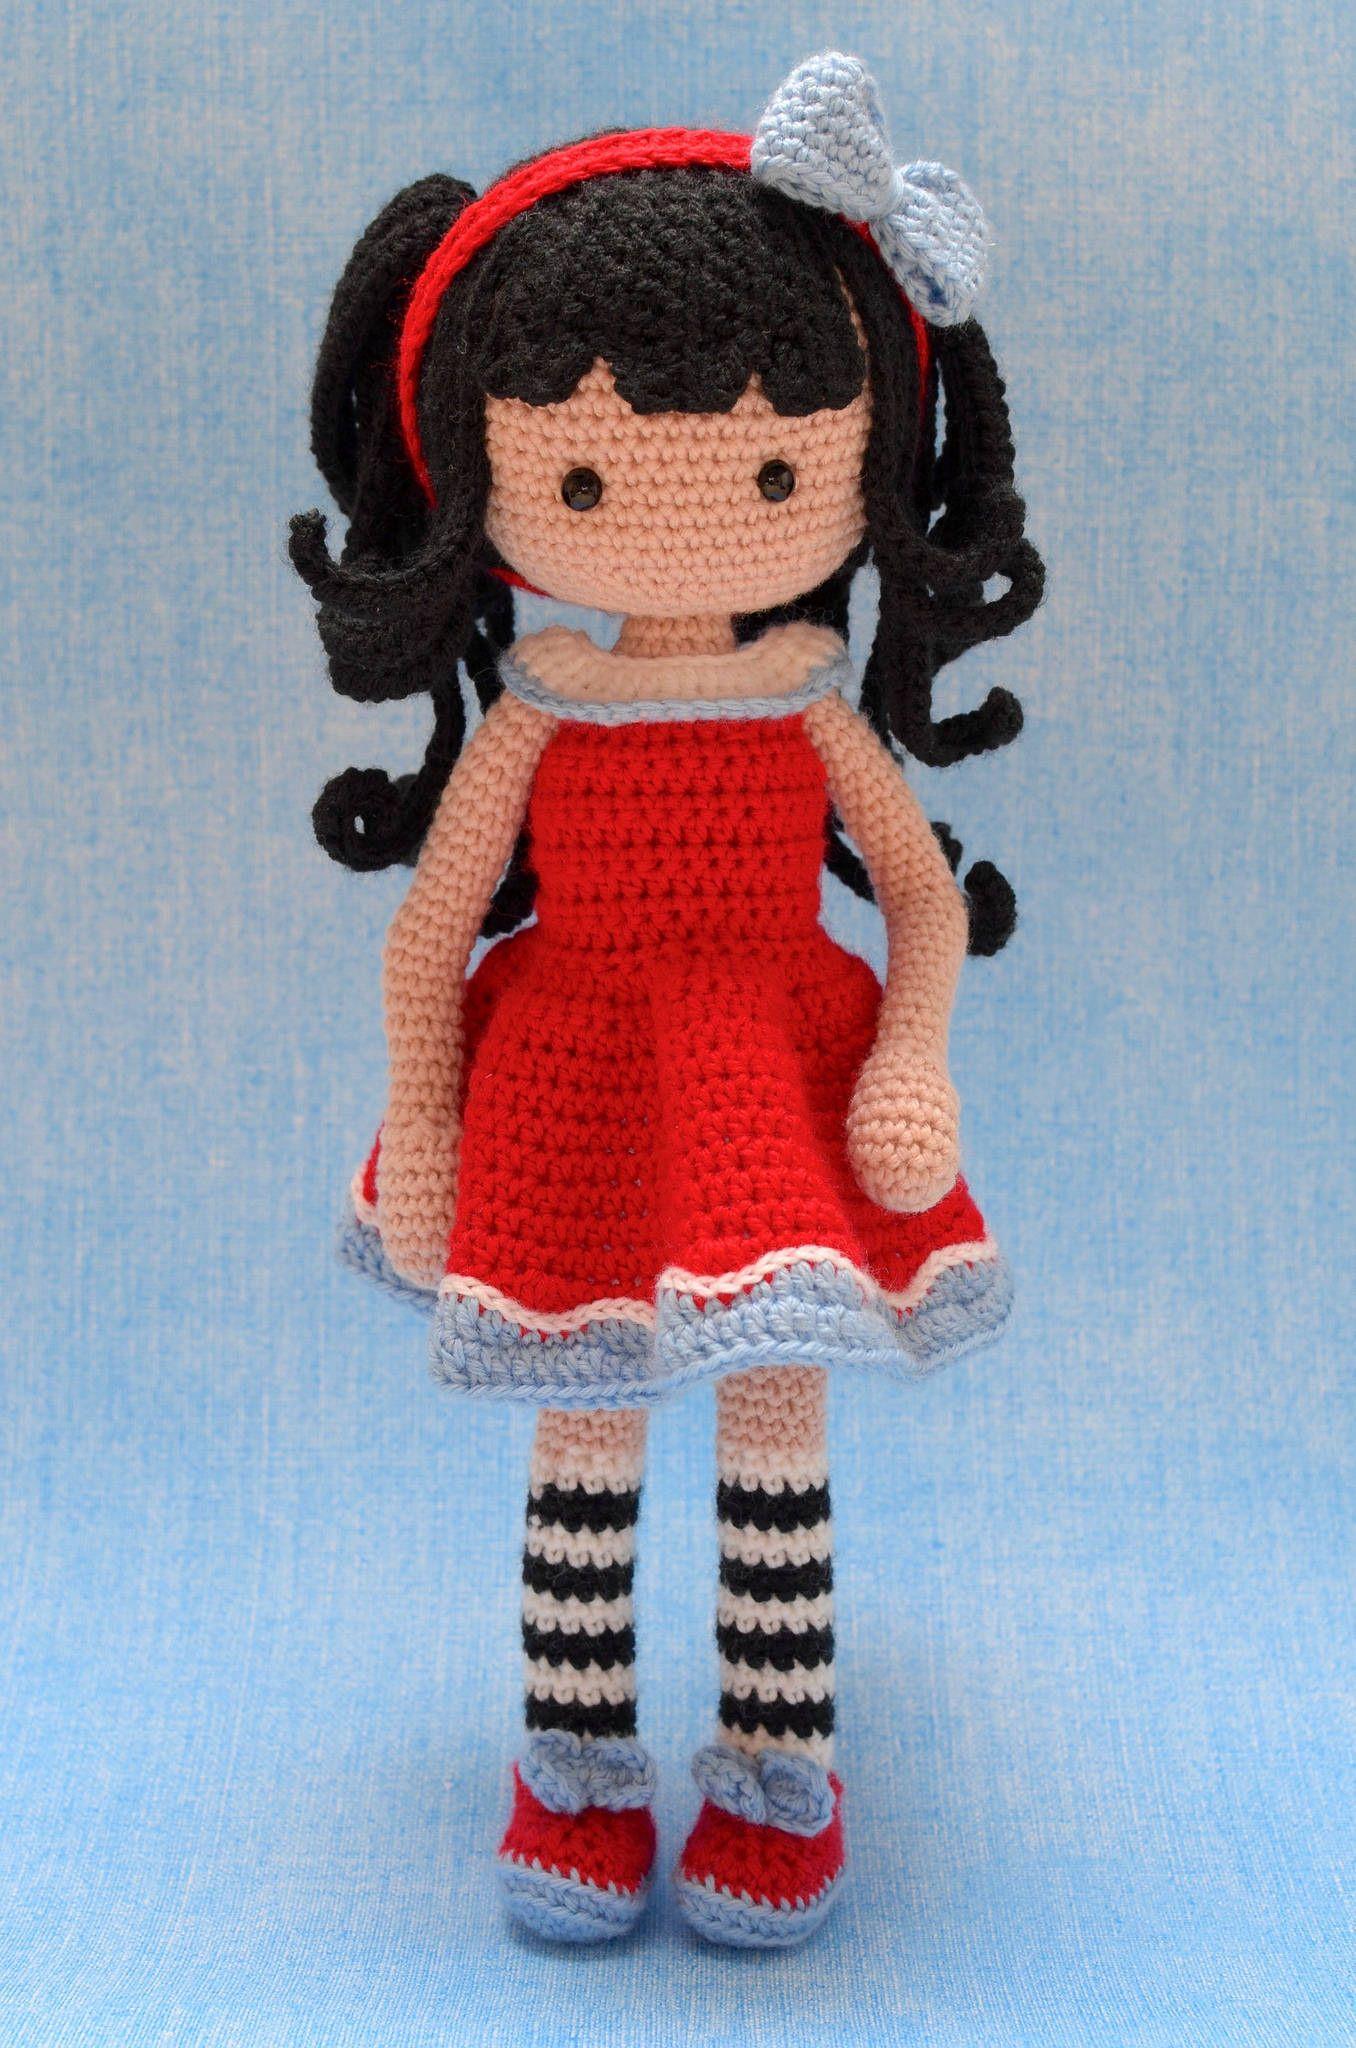 No 1 Dolls Amigurumi And Crochet